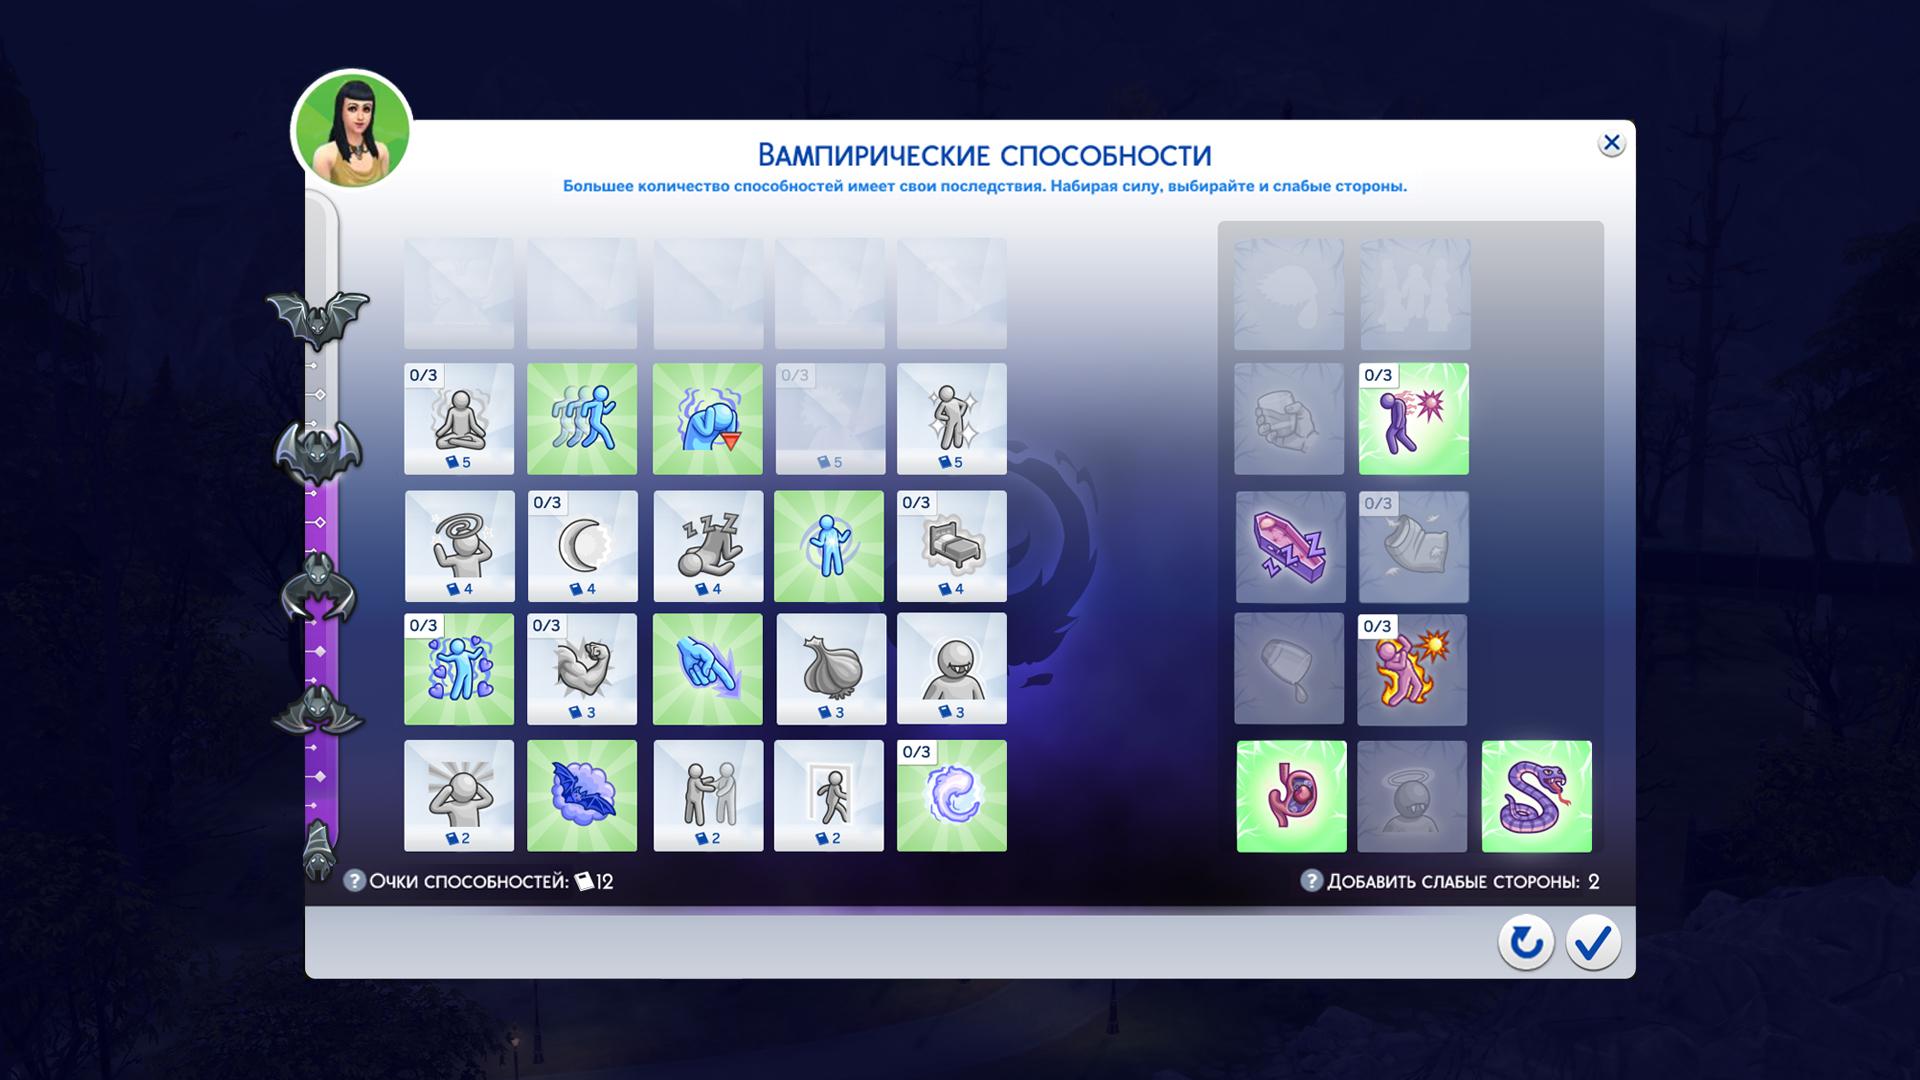 Прокачка Способностей В The Sims 4 Вампиры throughout Sims 4 Icons 2020